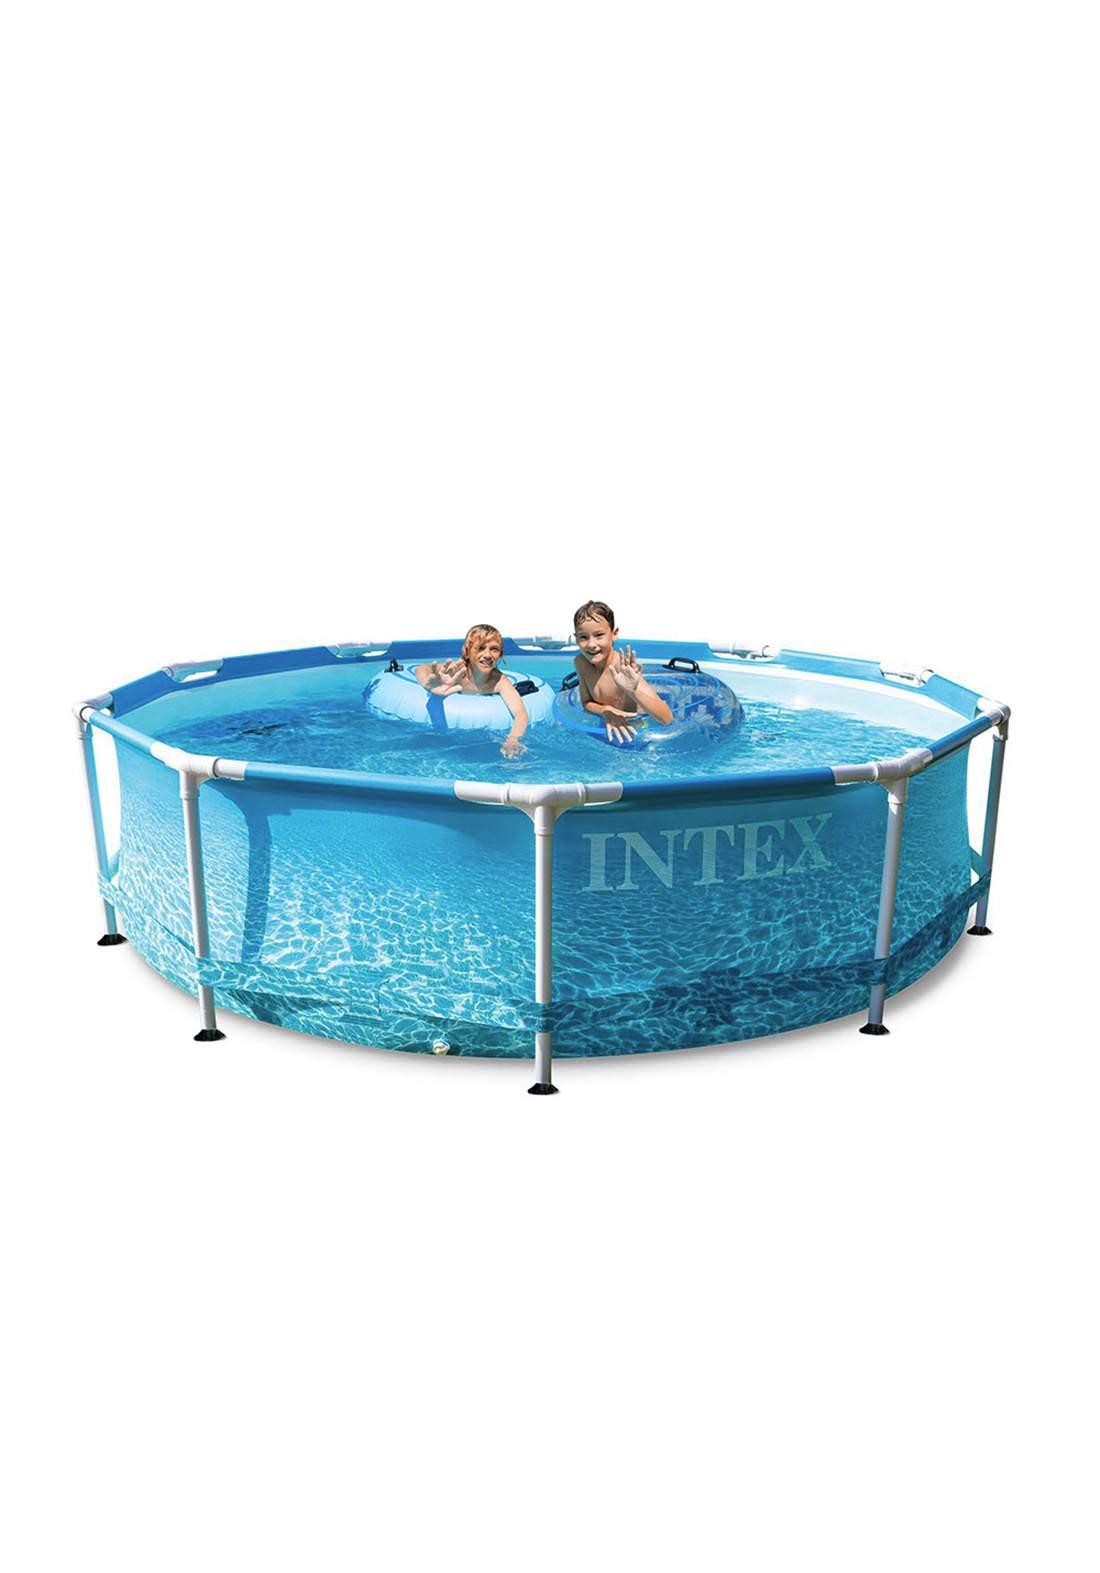 Intex 28208 Beachside Metal Frame Round Above Ground Pool مسبح